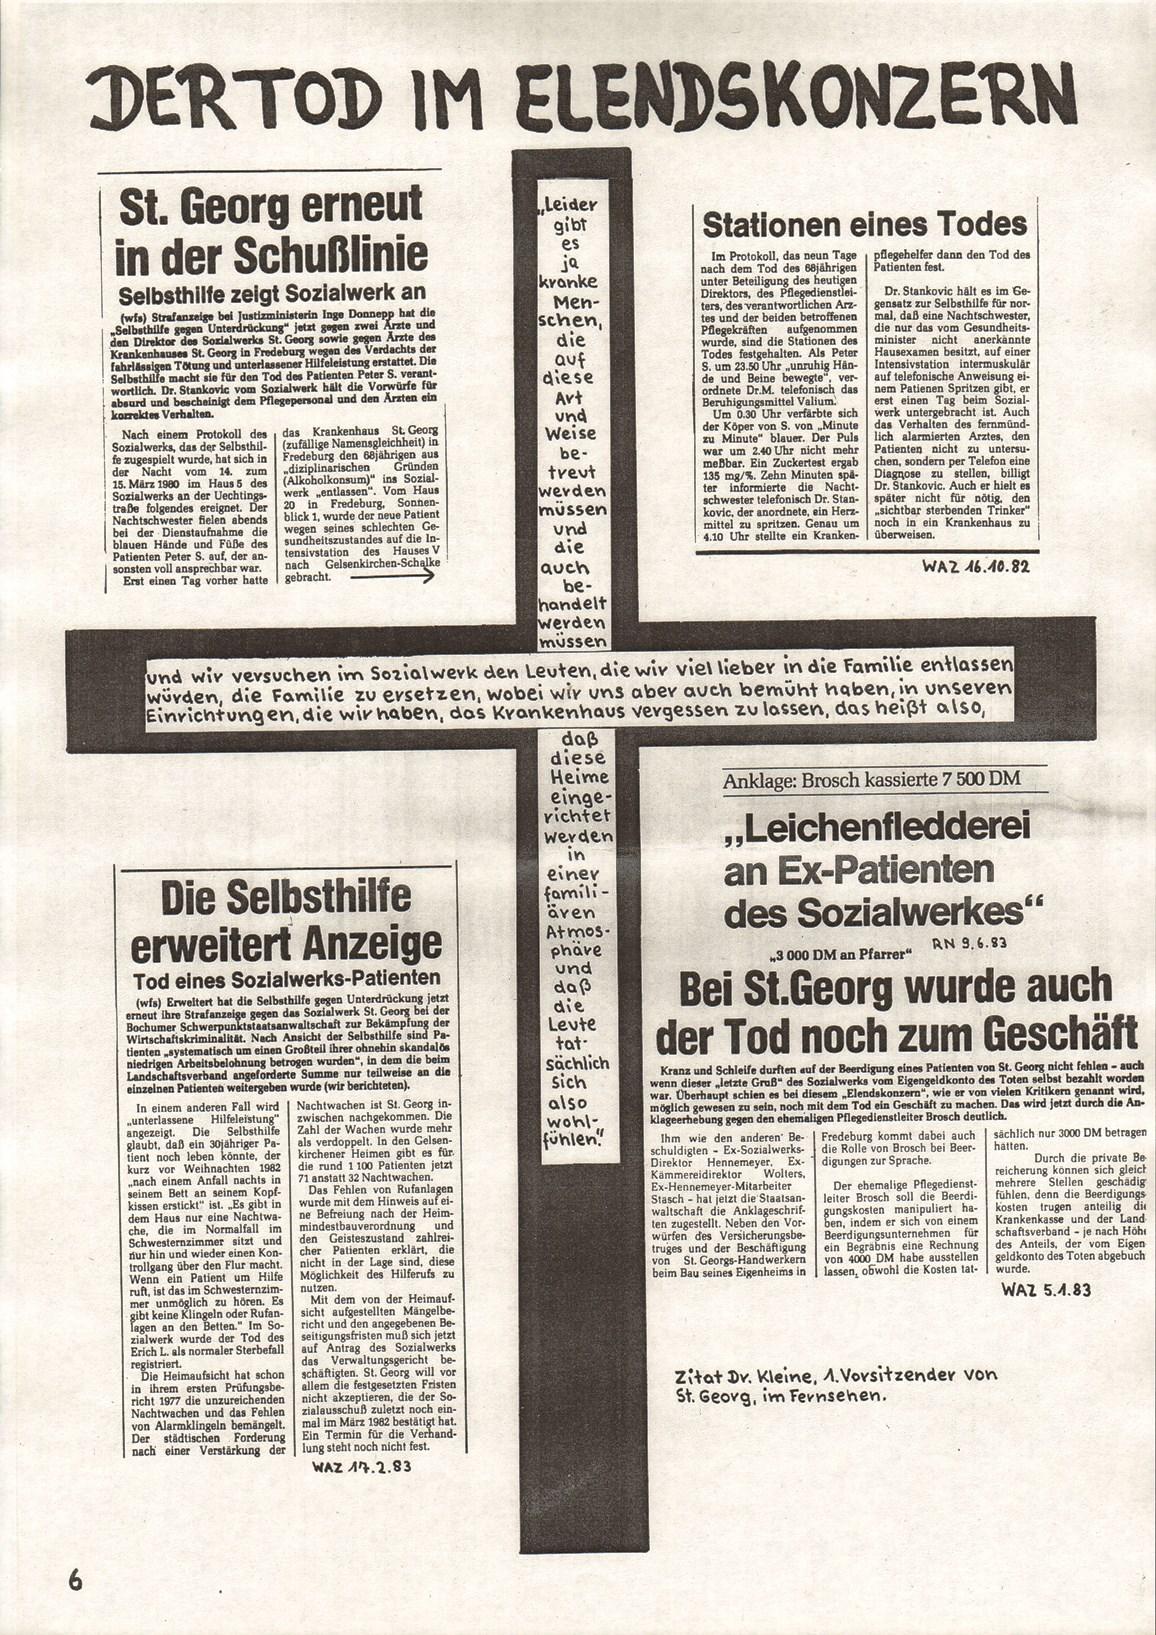 Gelsenkirchen_Selbsthilfe_Blatt_1983_02_06